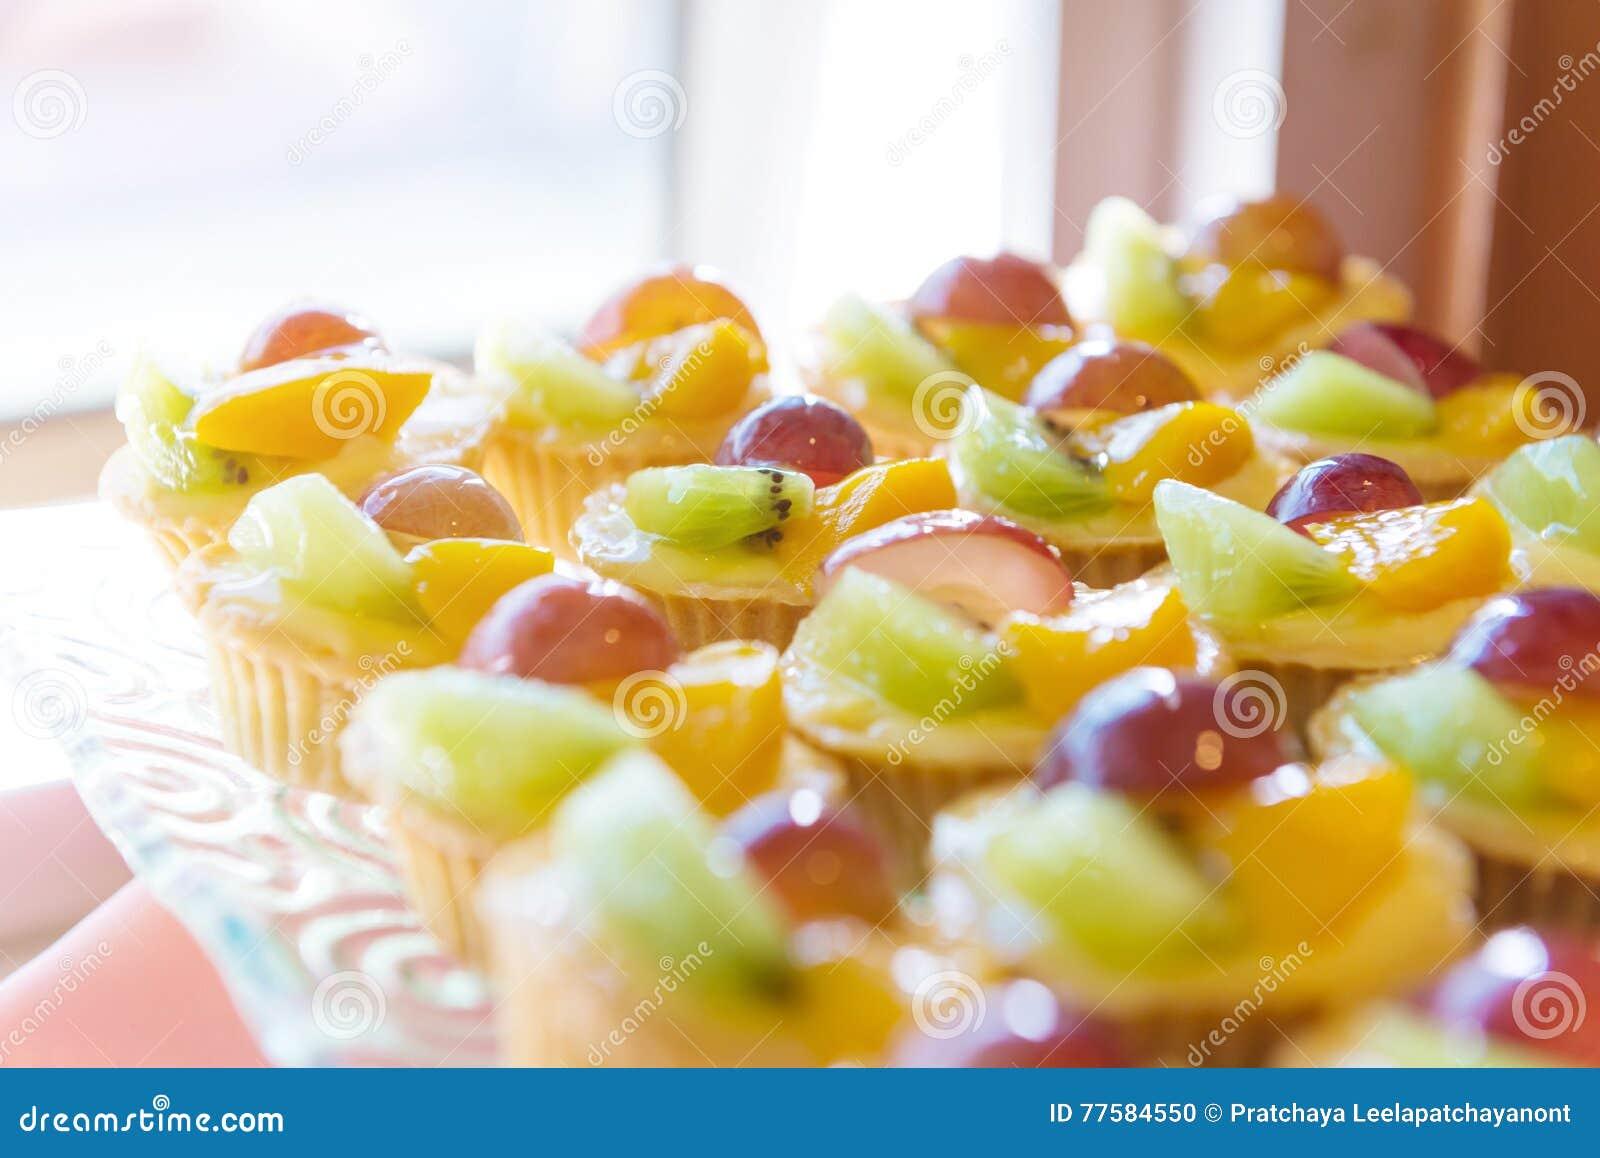 Tarte mélangée de crème anglaise de fruit frais